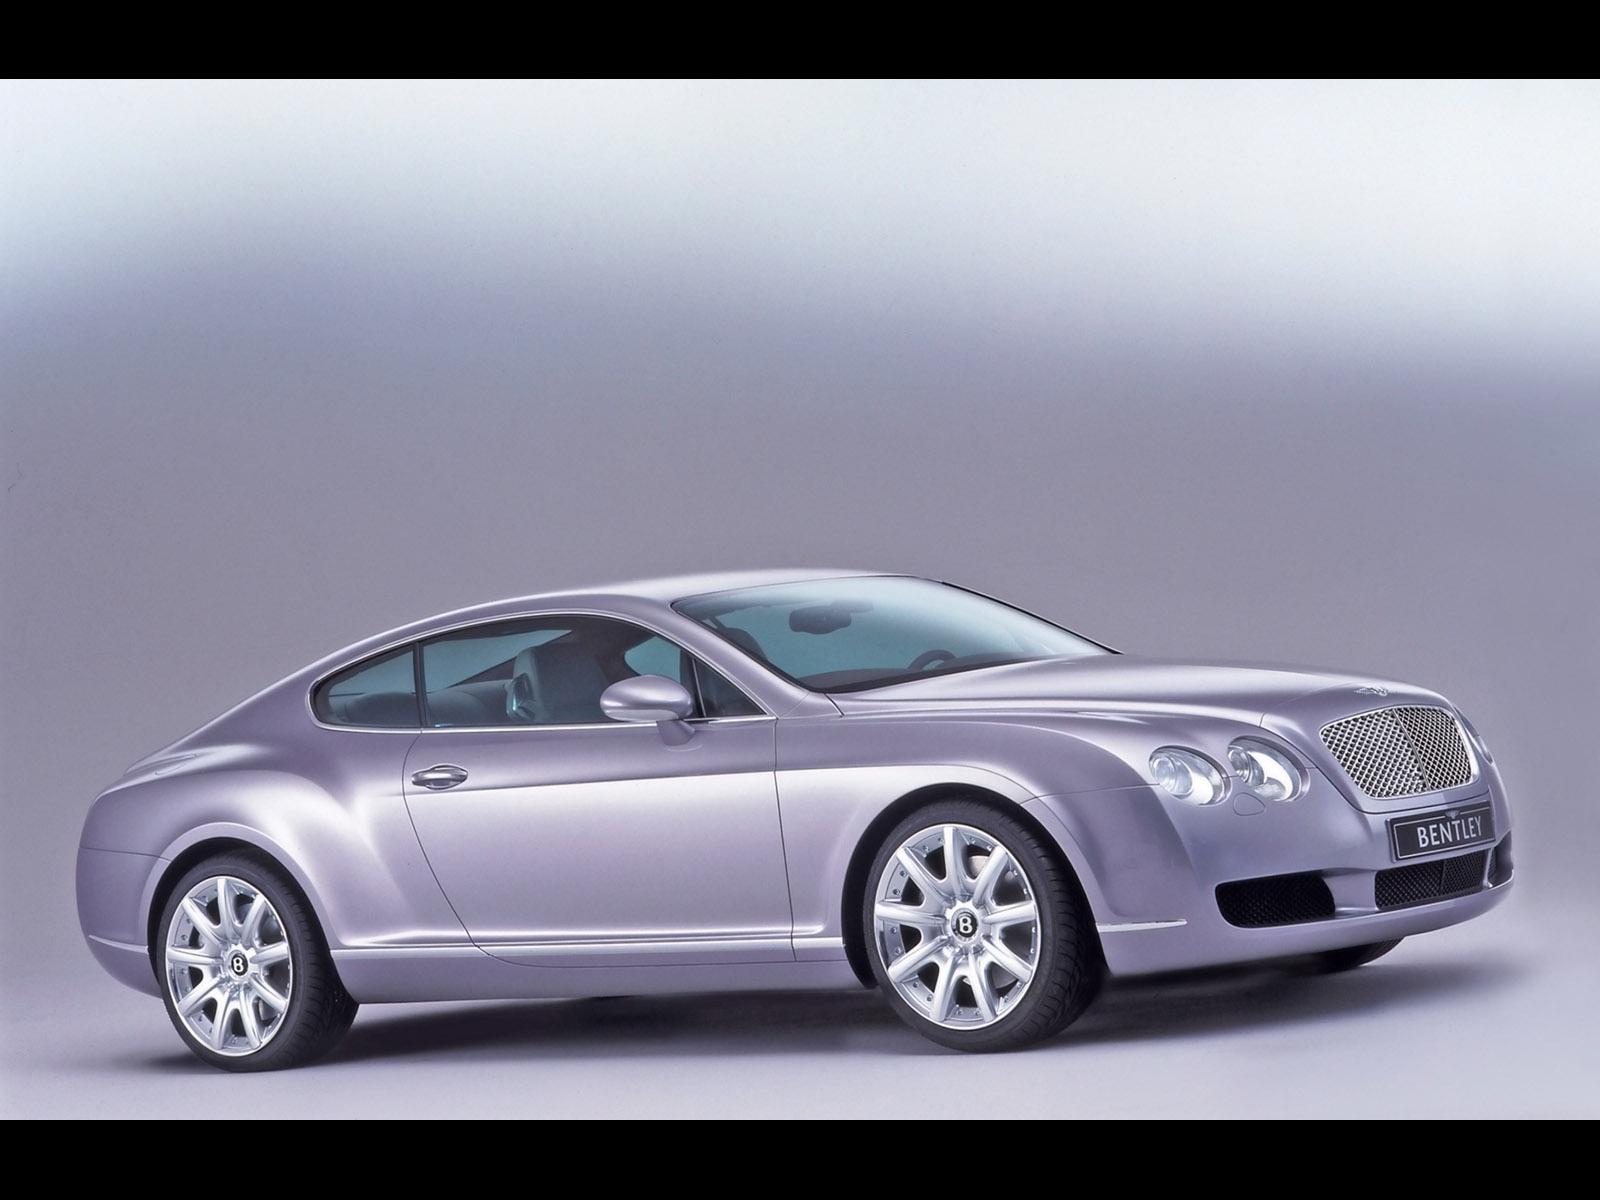 Bentley Continental Picture 6223 Bentley Photo Gallery Carsbase Com